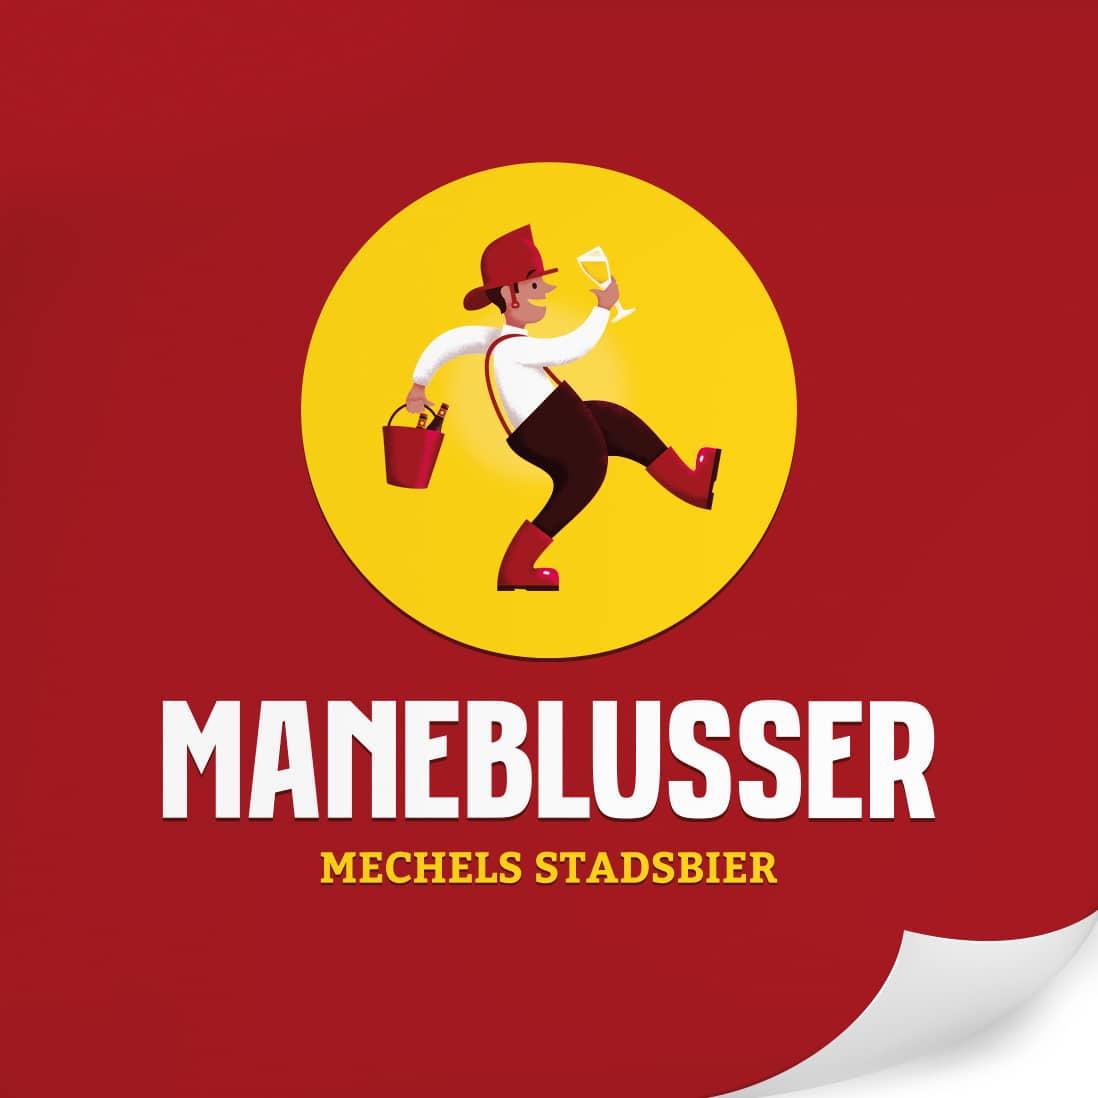 Maneblusser_LogoBucket